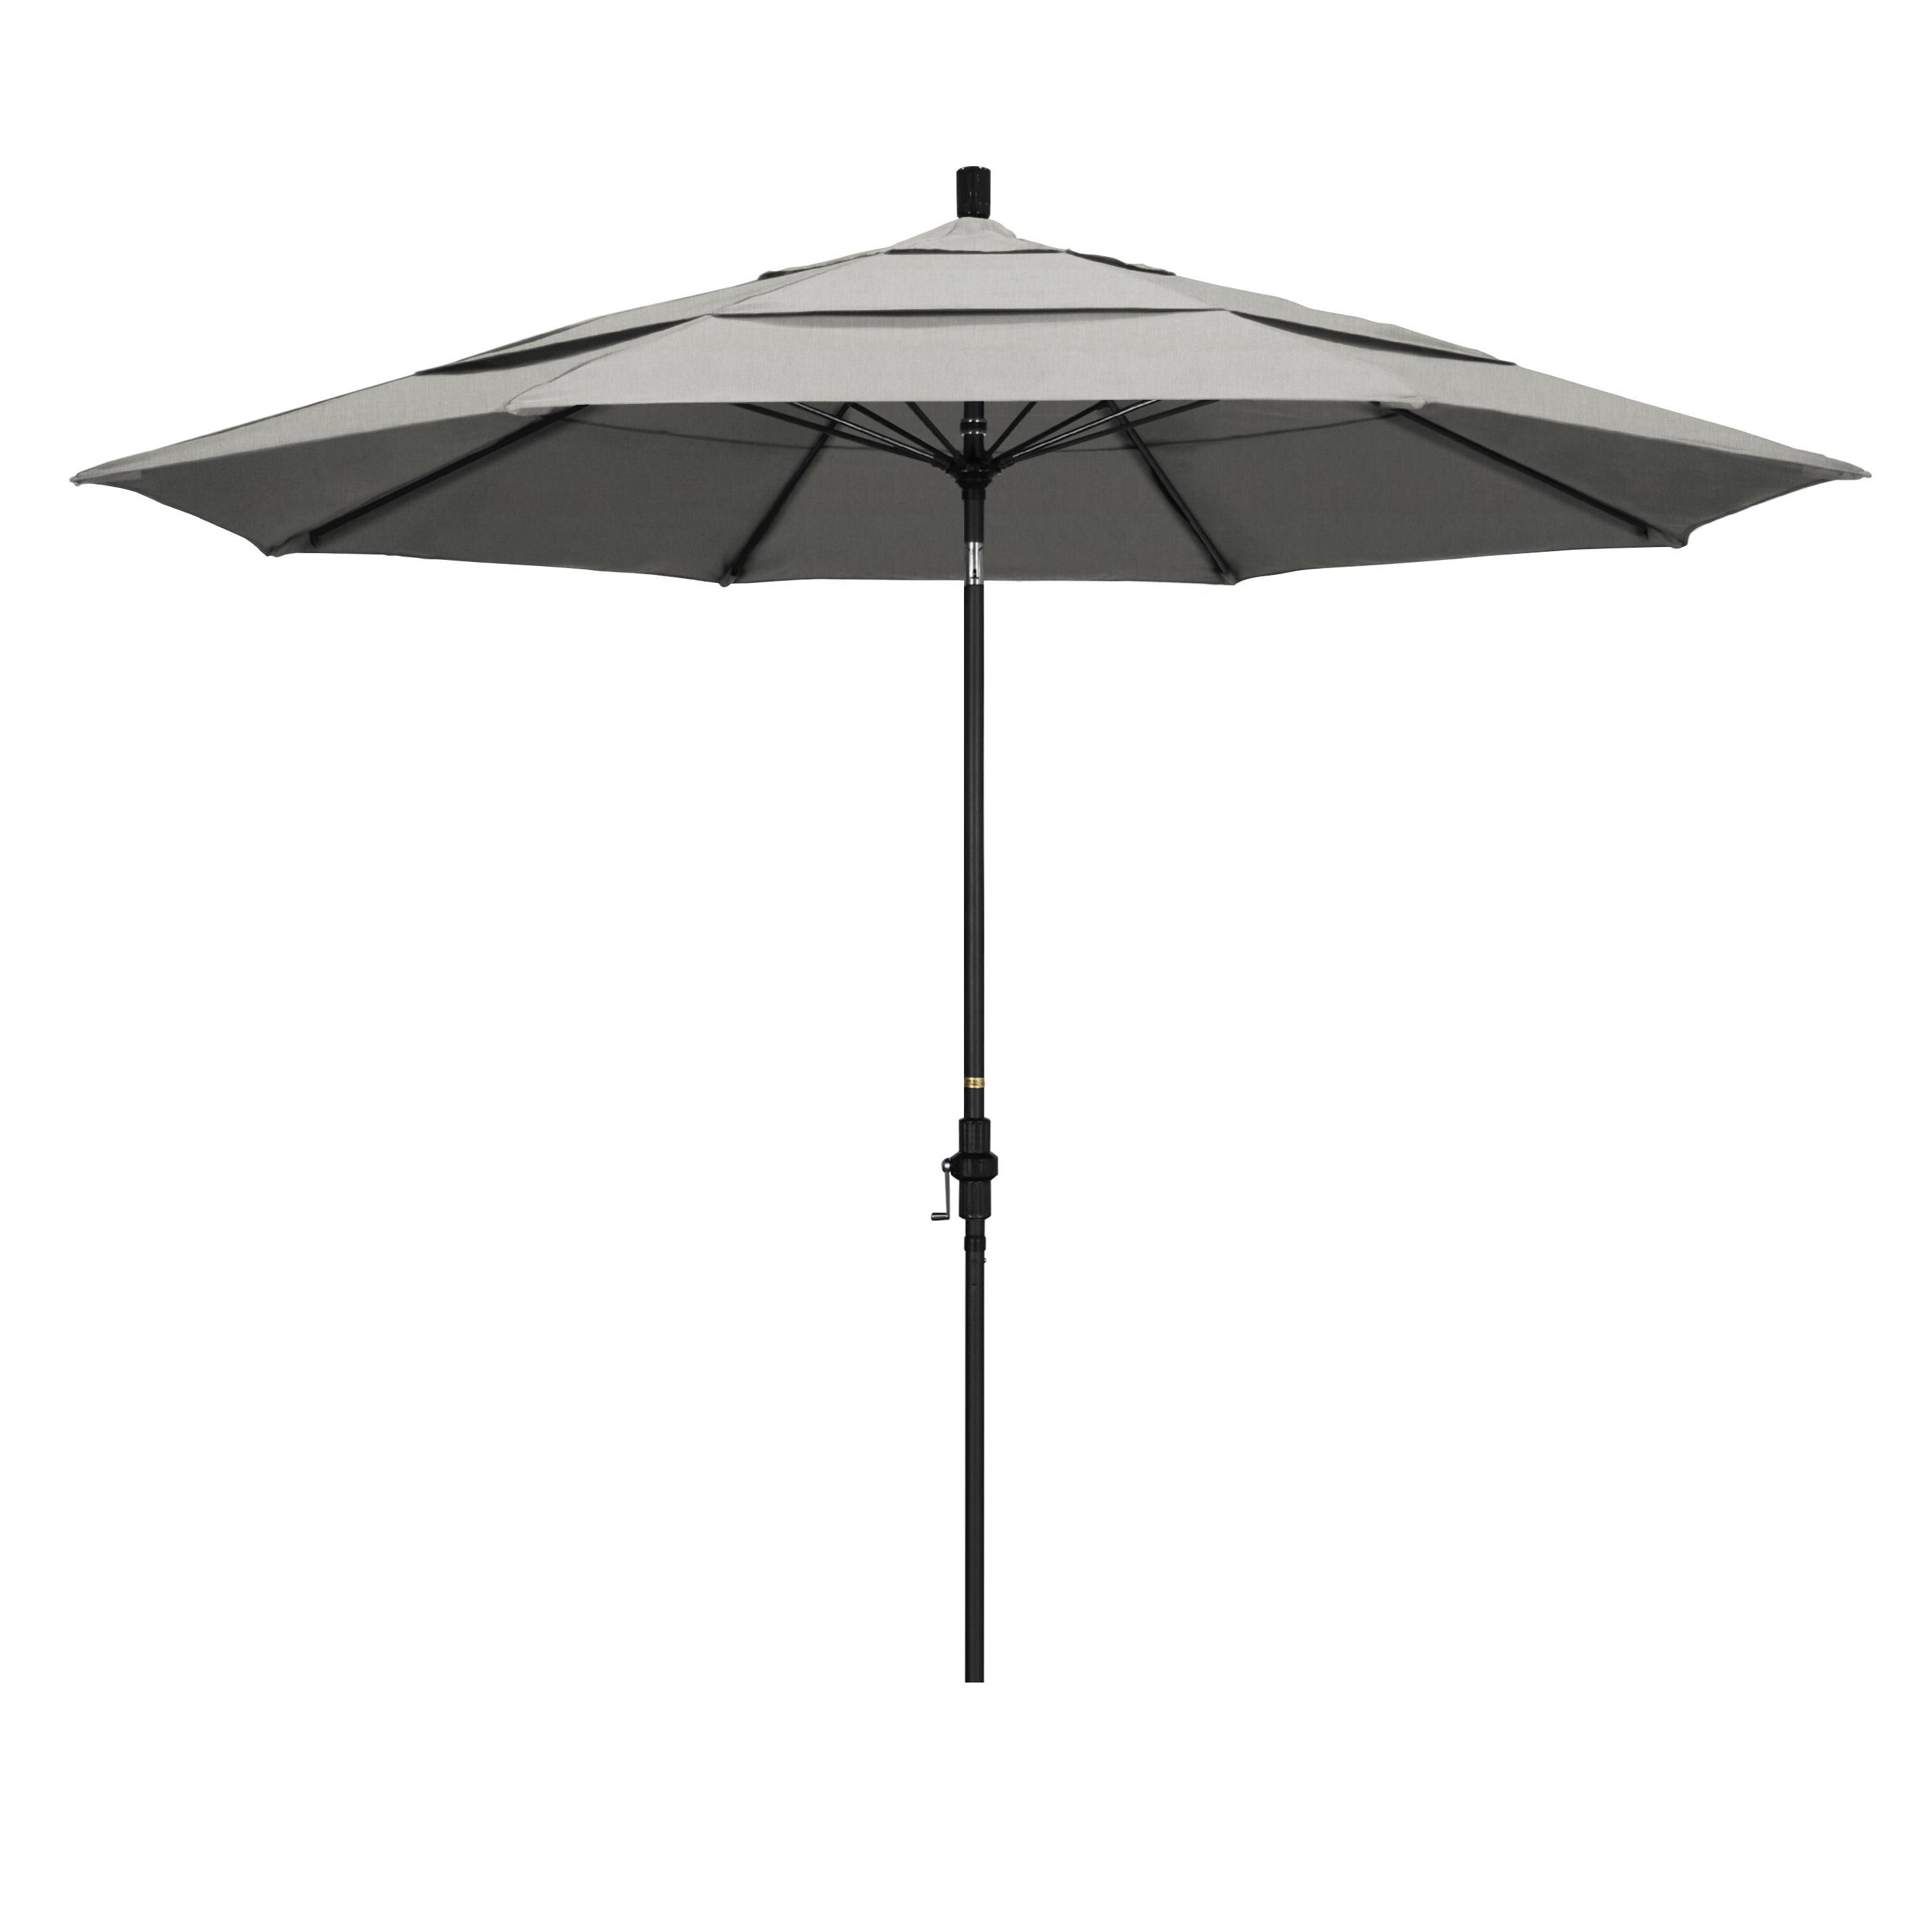 Launceston Rectangular Market Umbrellas Within Well Liked Keegan 11' Market Umbrella & Reviews (View 11 of 20)